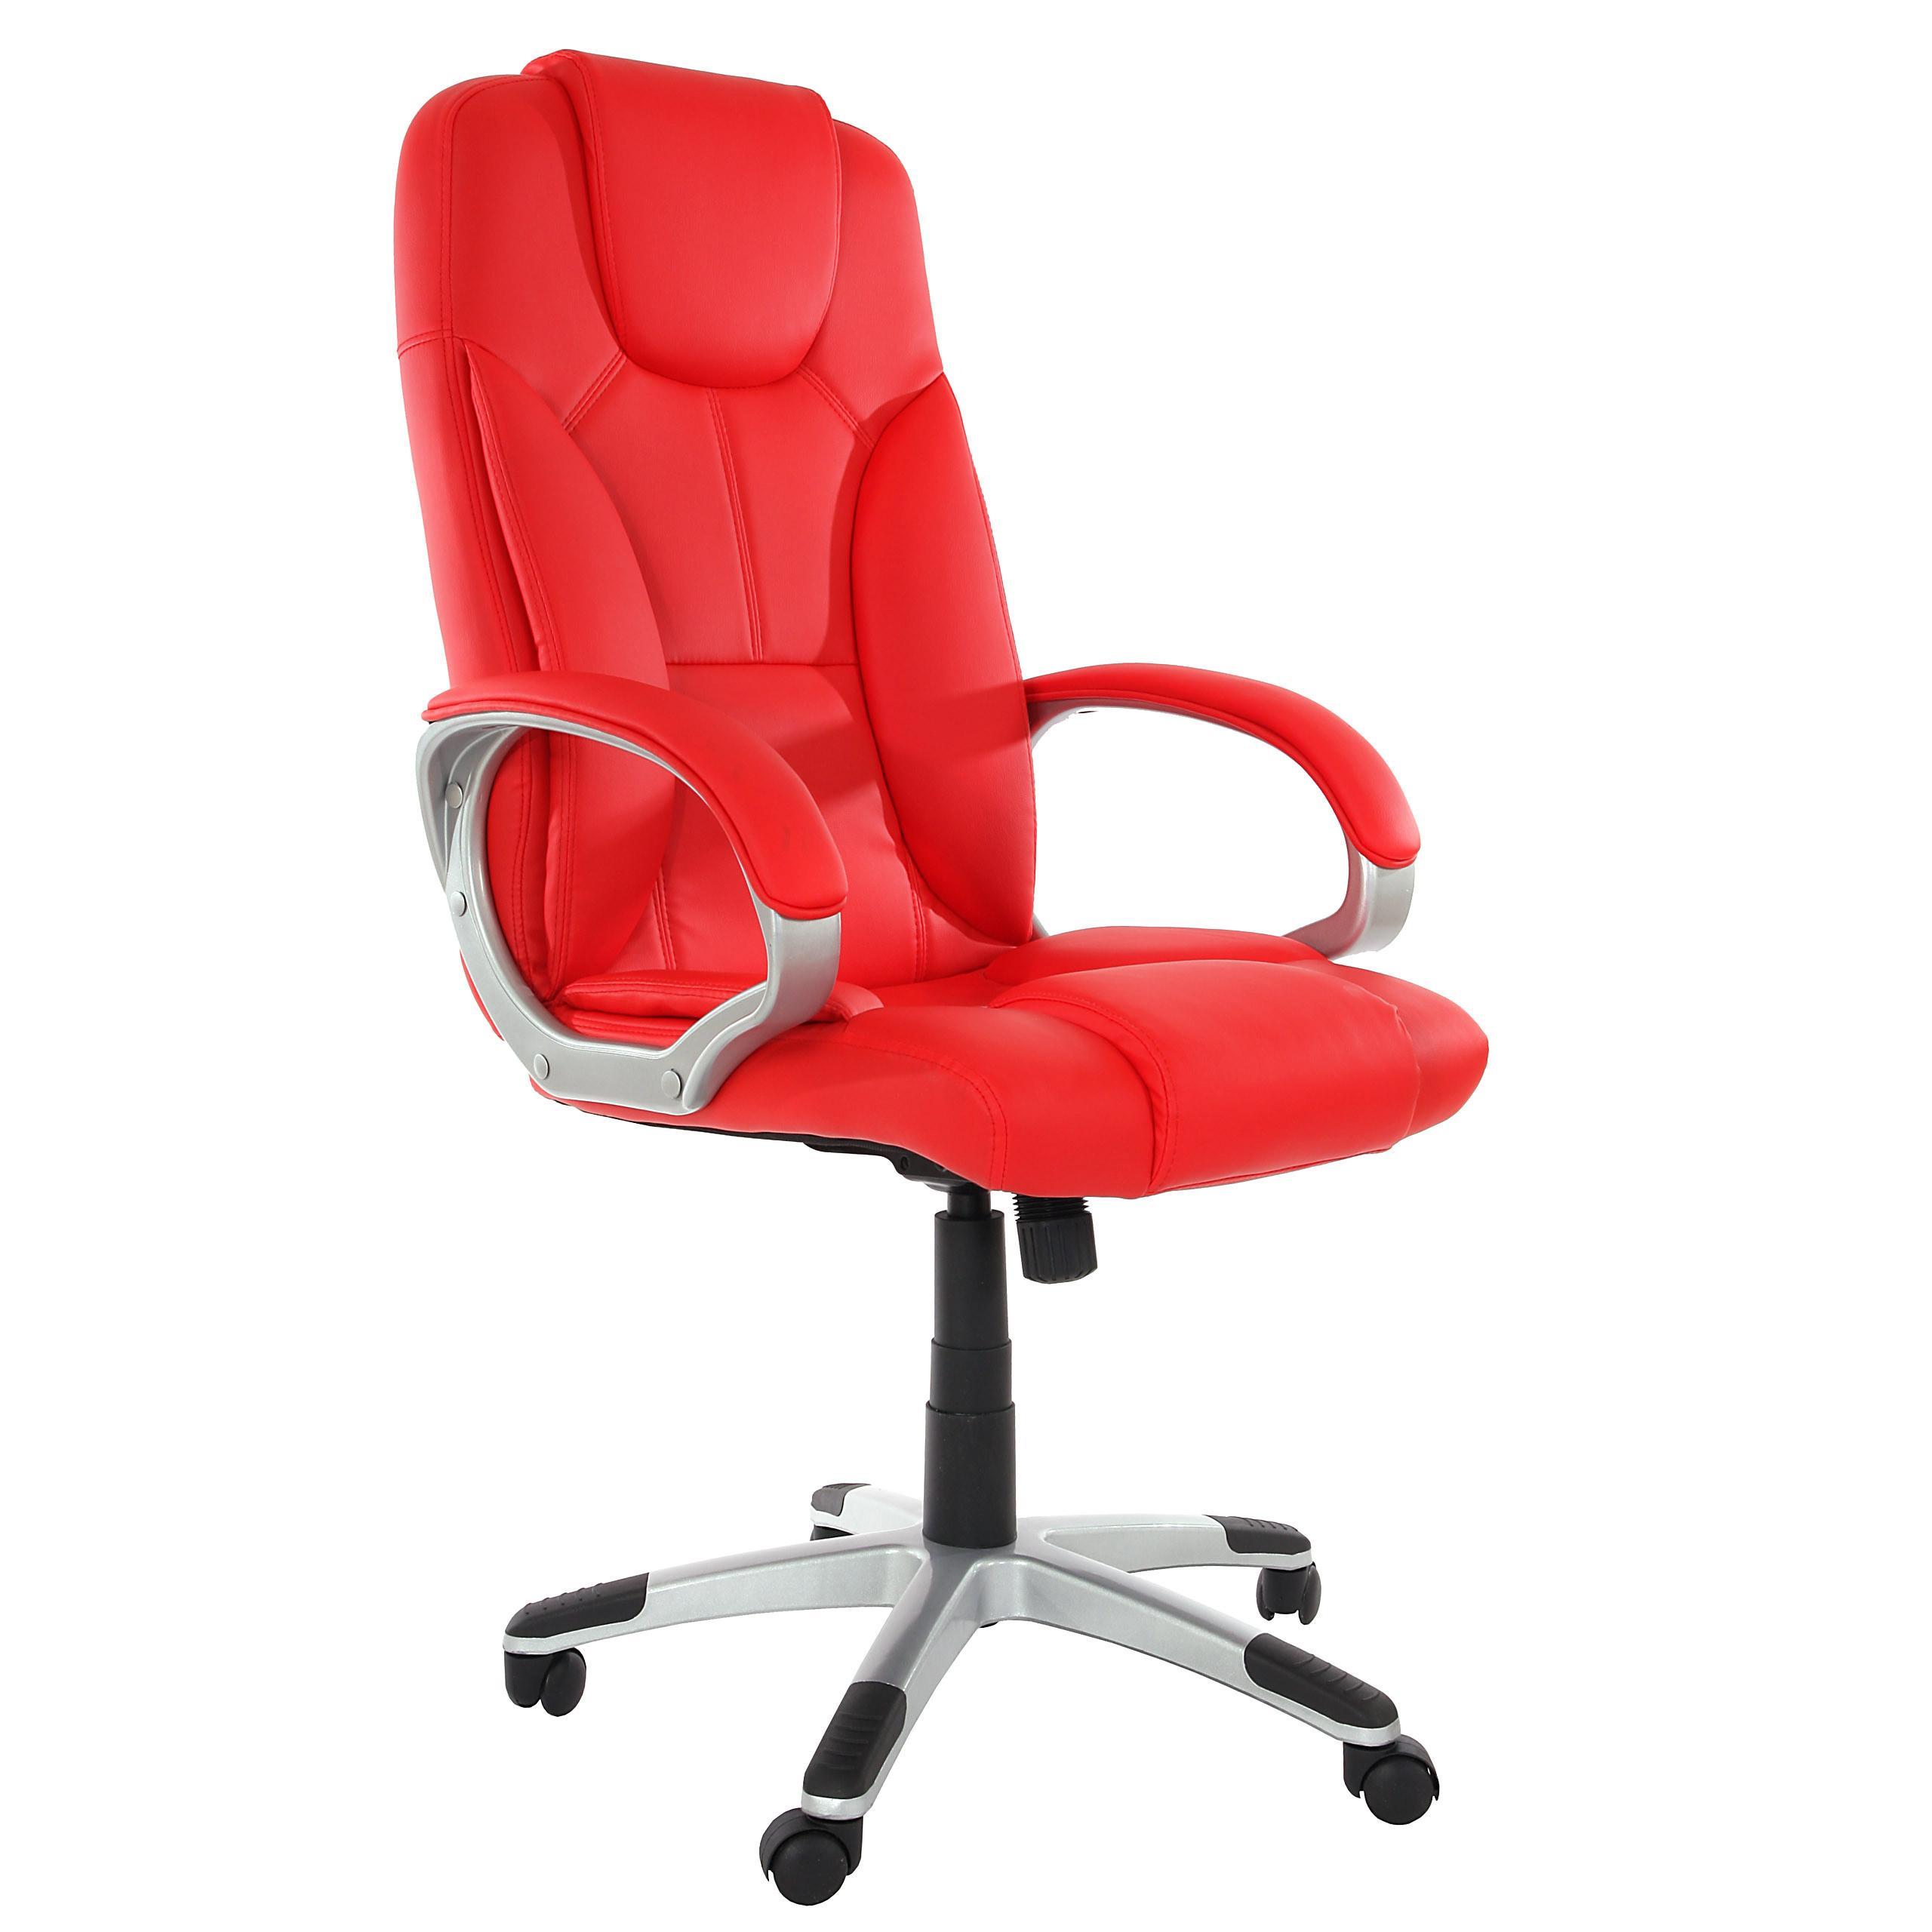 Sill n de oficina arona acolchado rojo sill n de for Precio de sillones para oficina